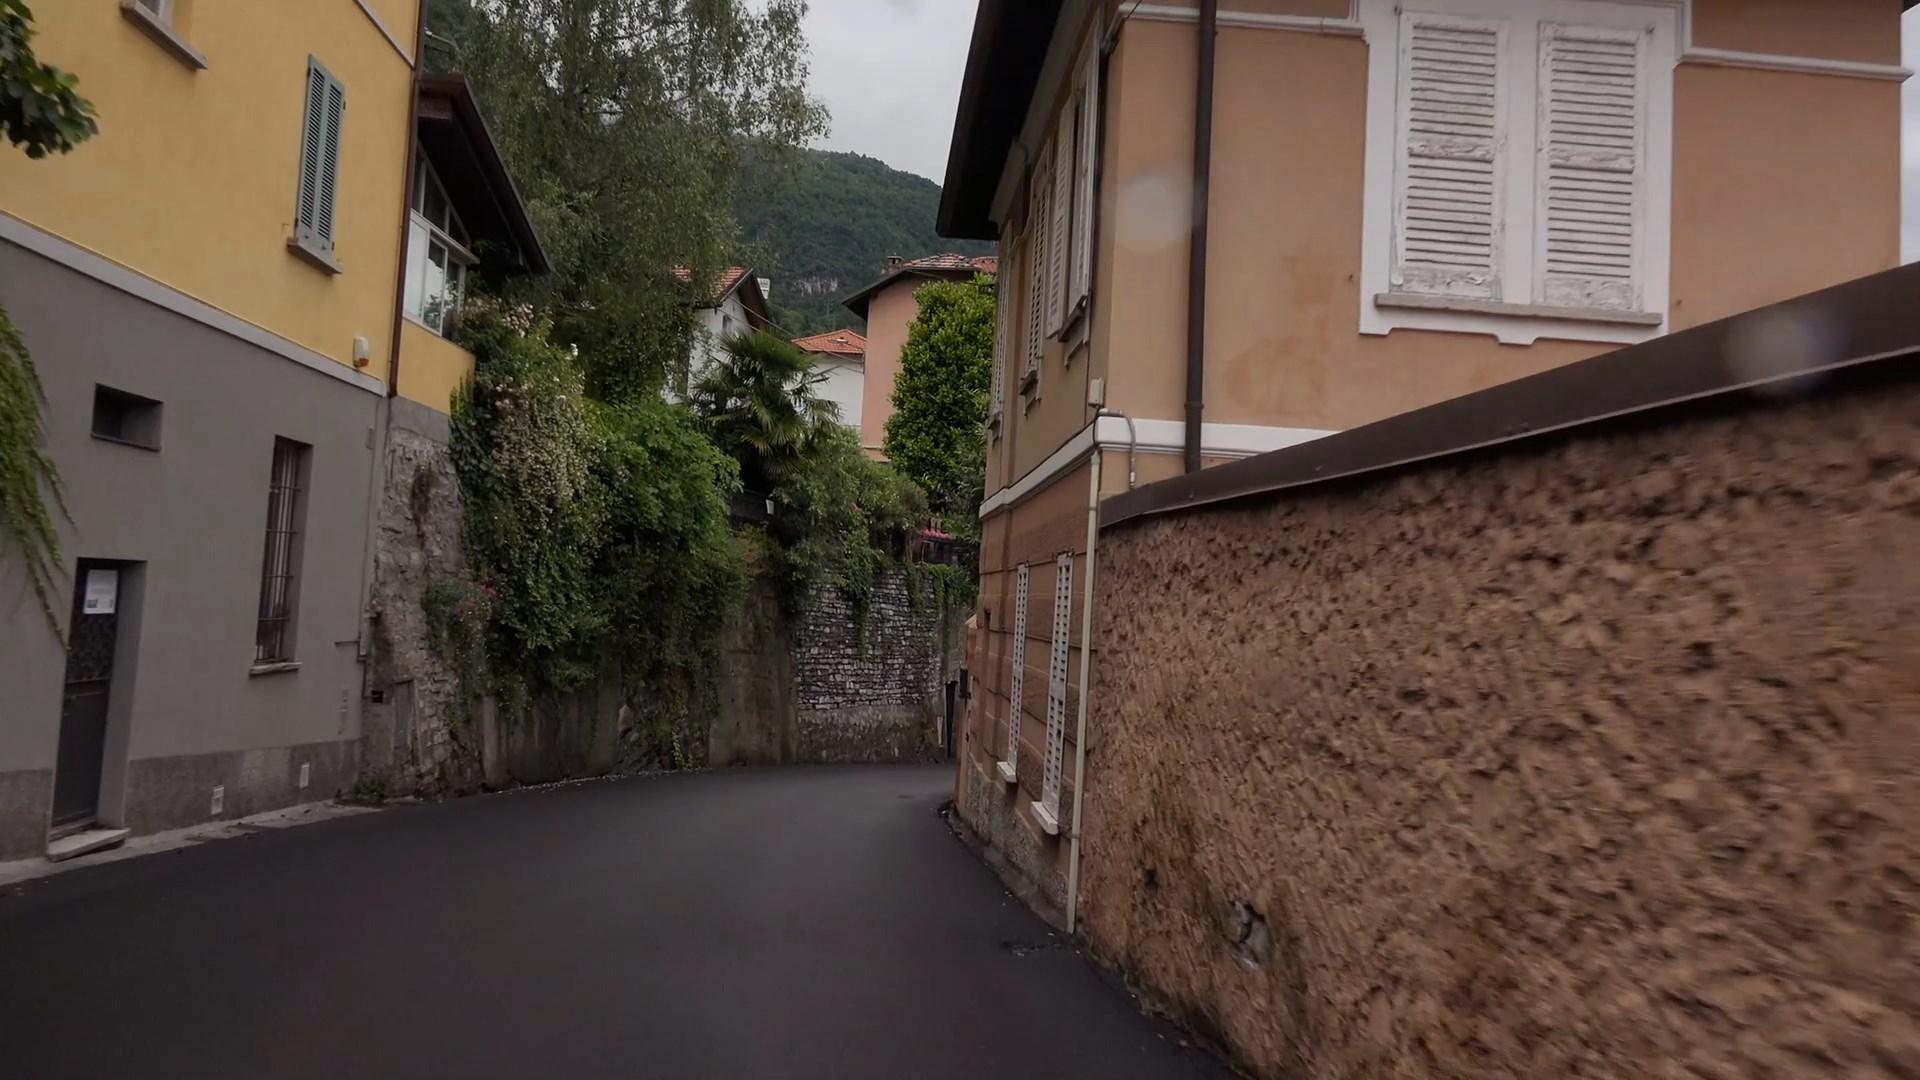 Part 2 of Lake Como Grand Tour. Gallery Image 5